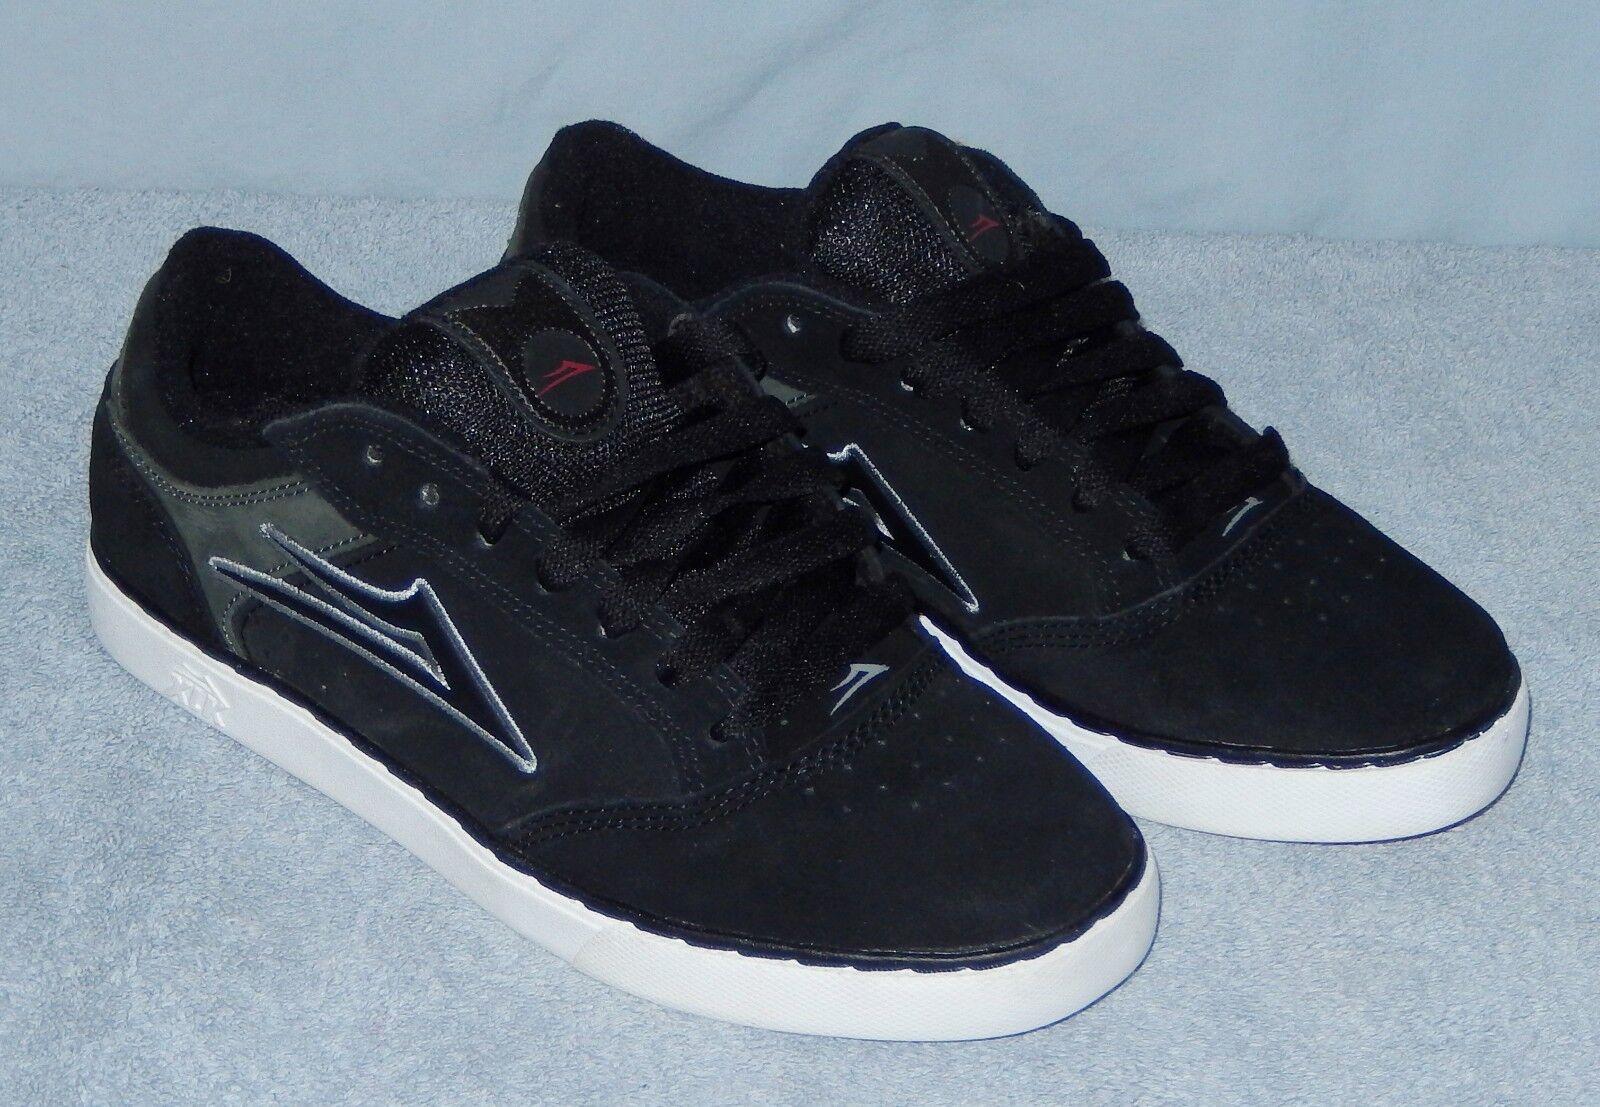 Lakai Mike Mo Skateboard Shoes Size 7 Black Suede